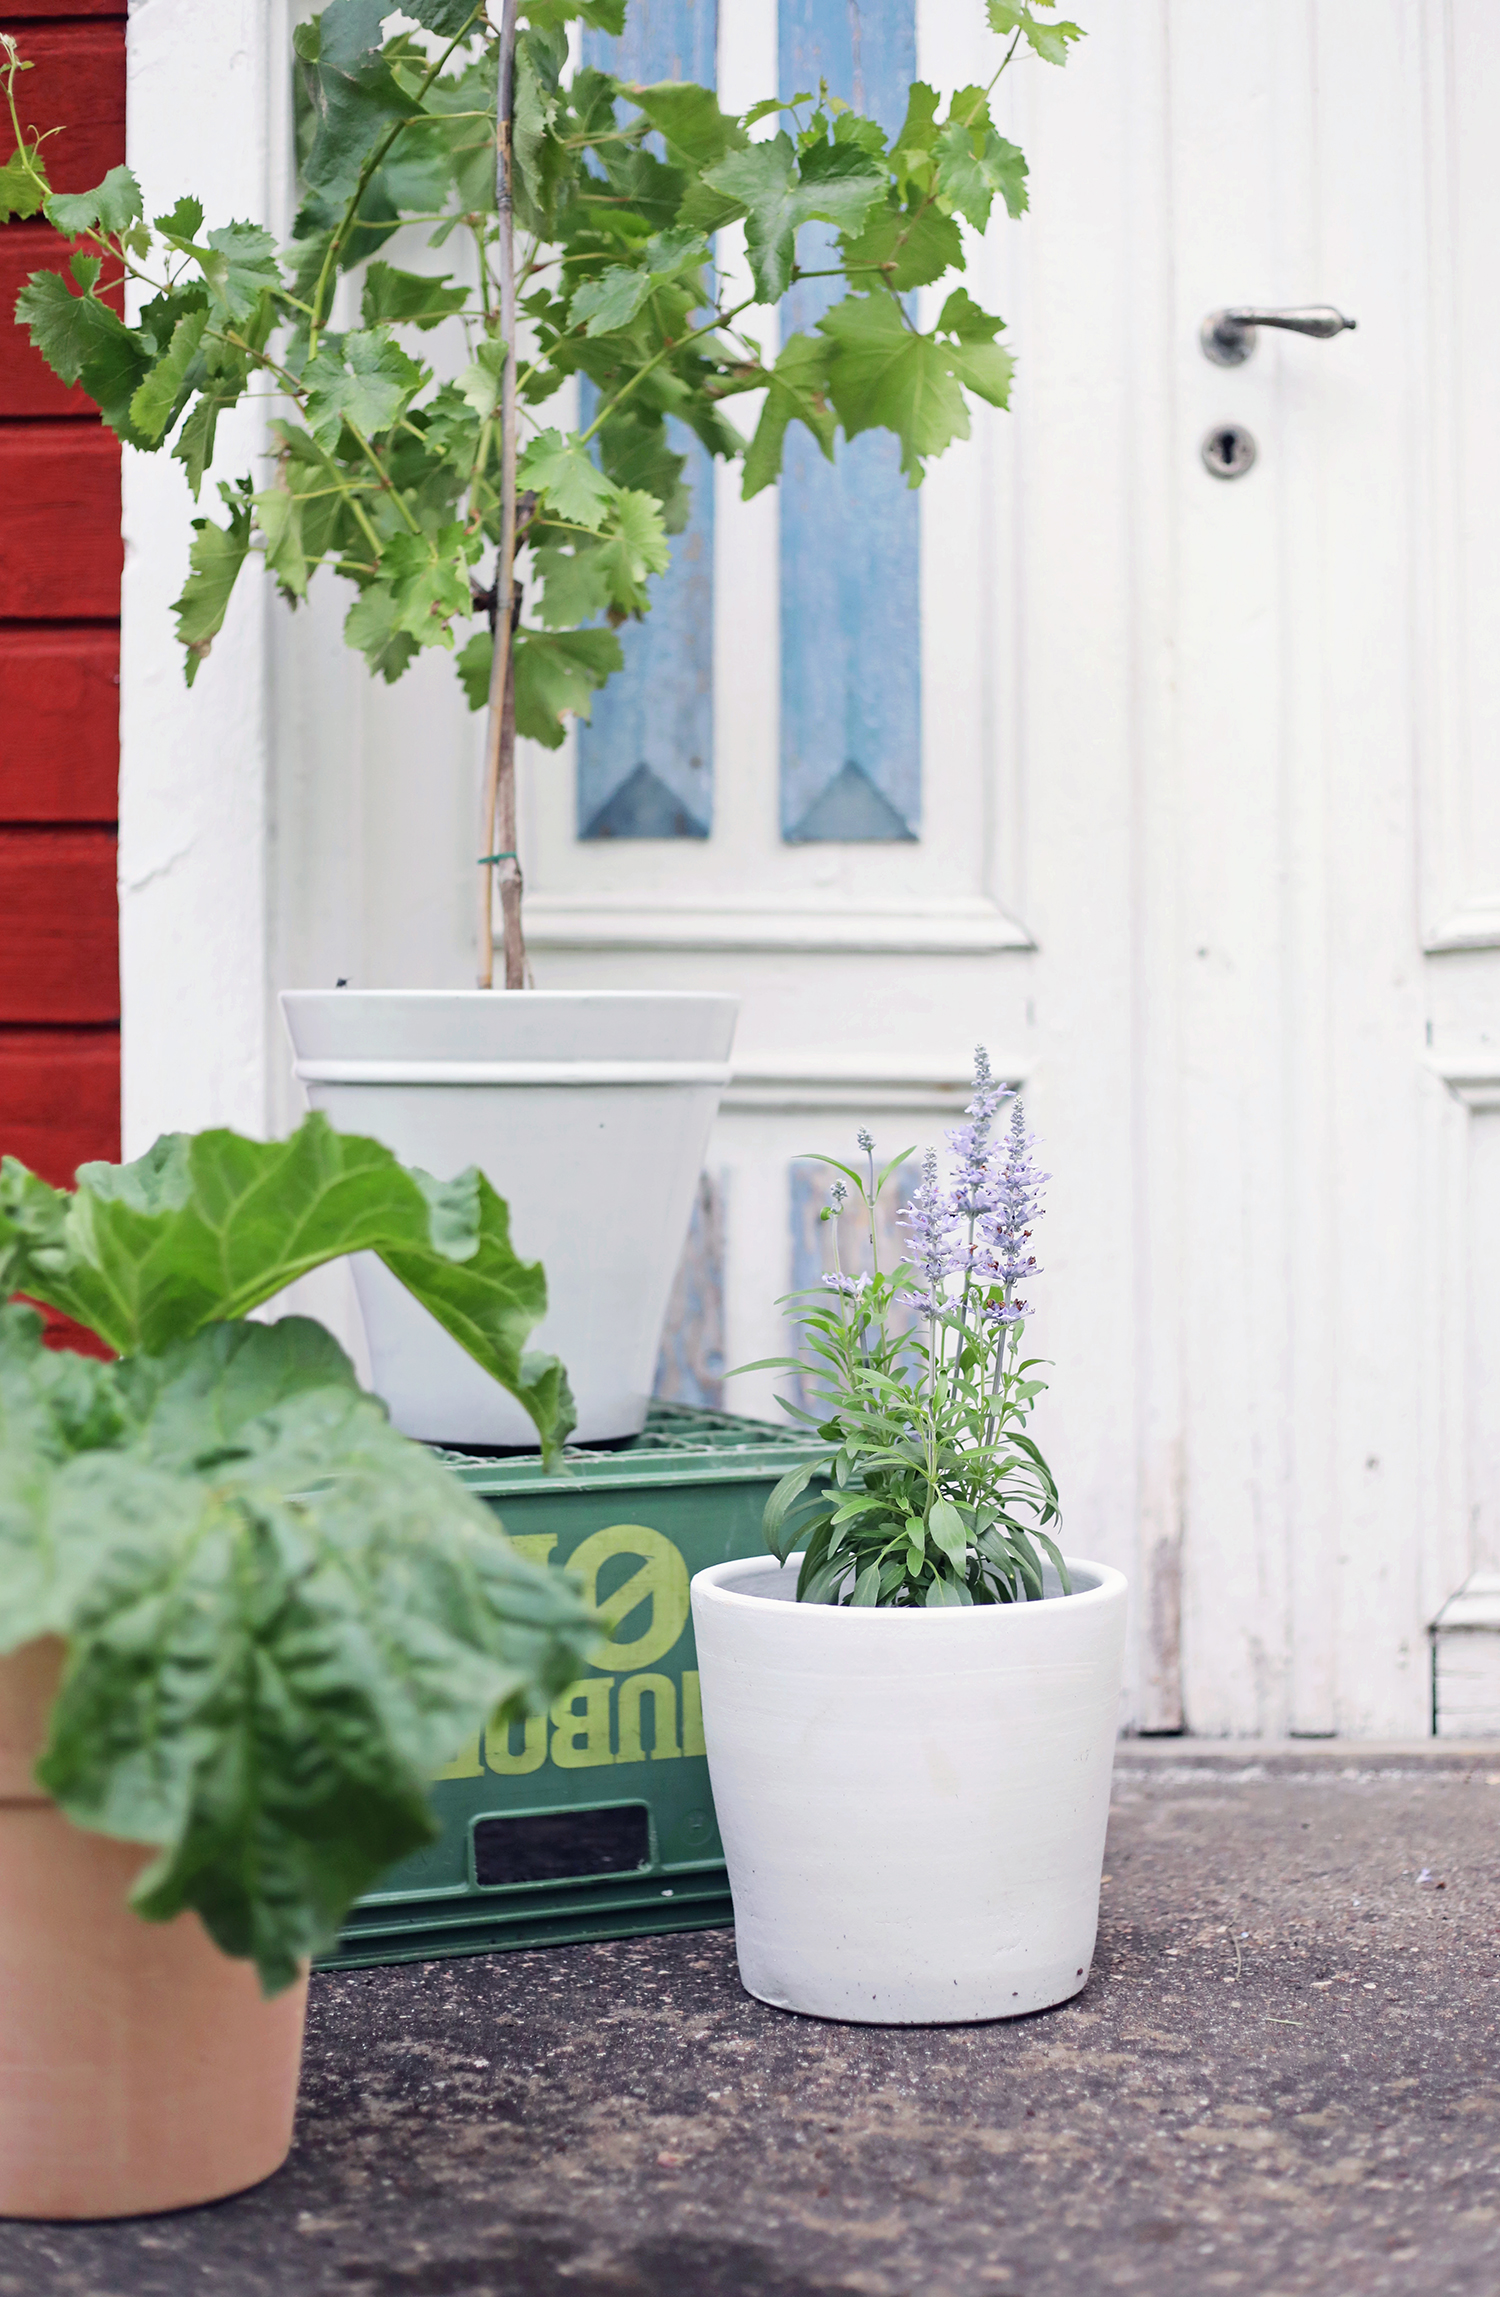 blomsterlandet gotland torp krukor odla växter trädgård vinranka